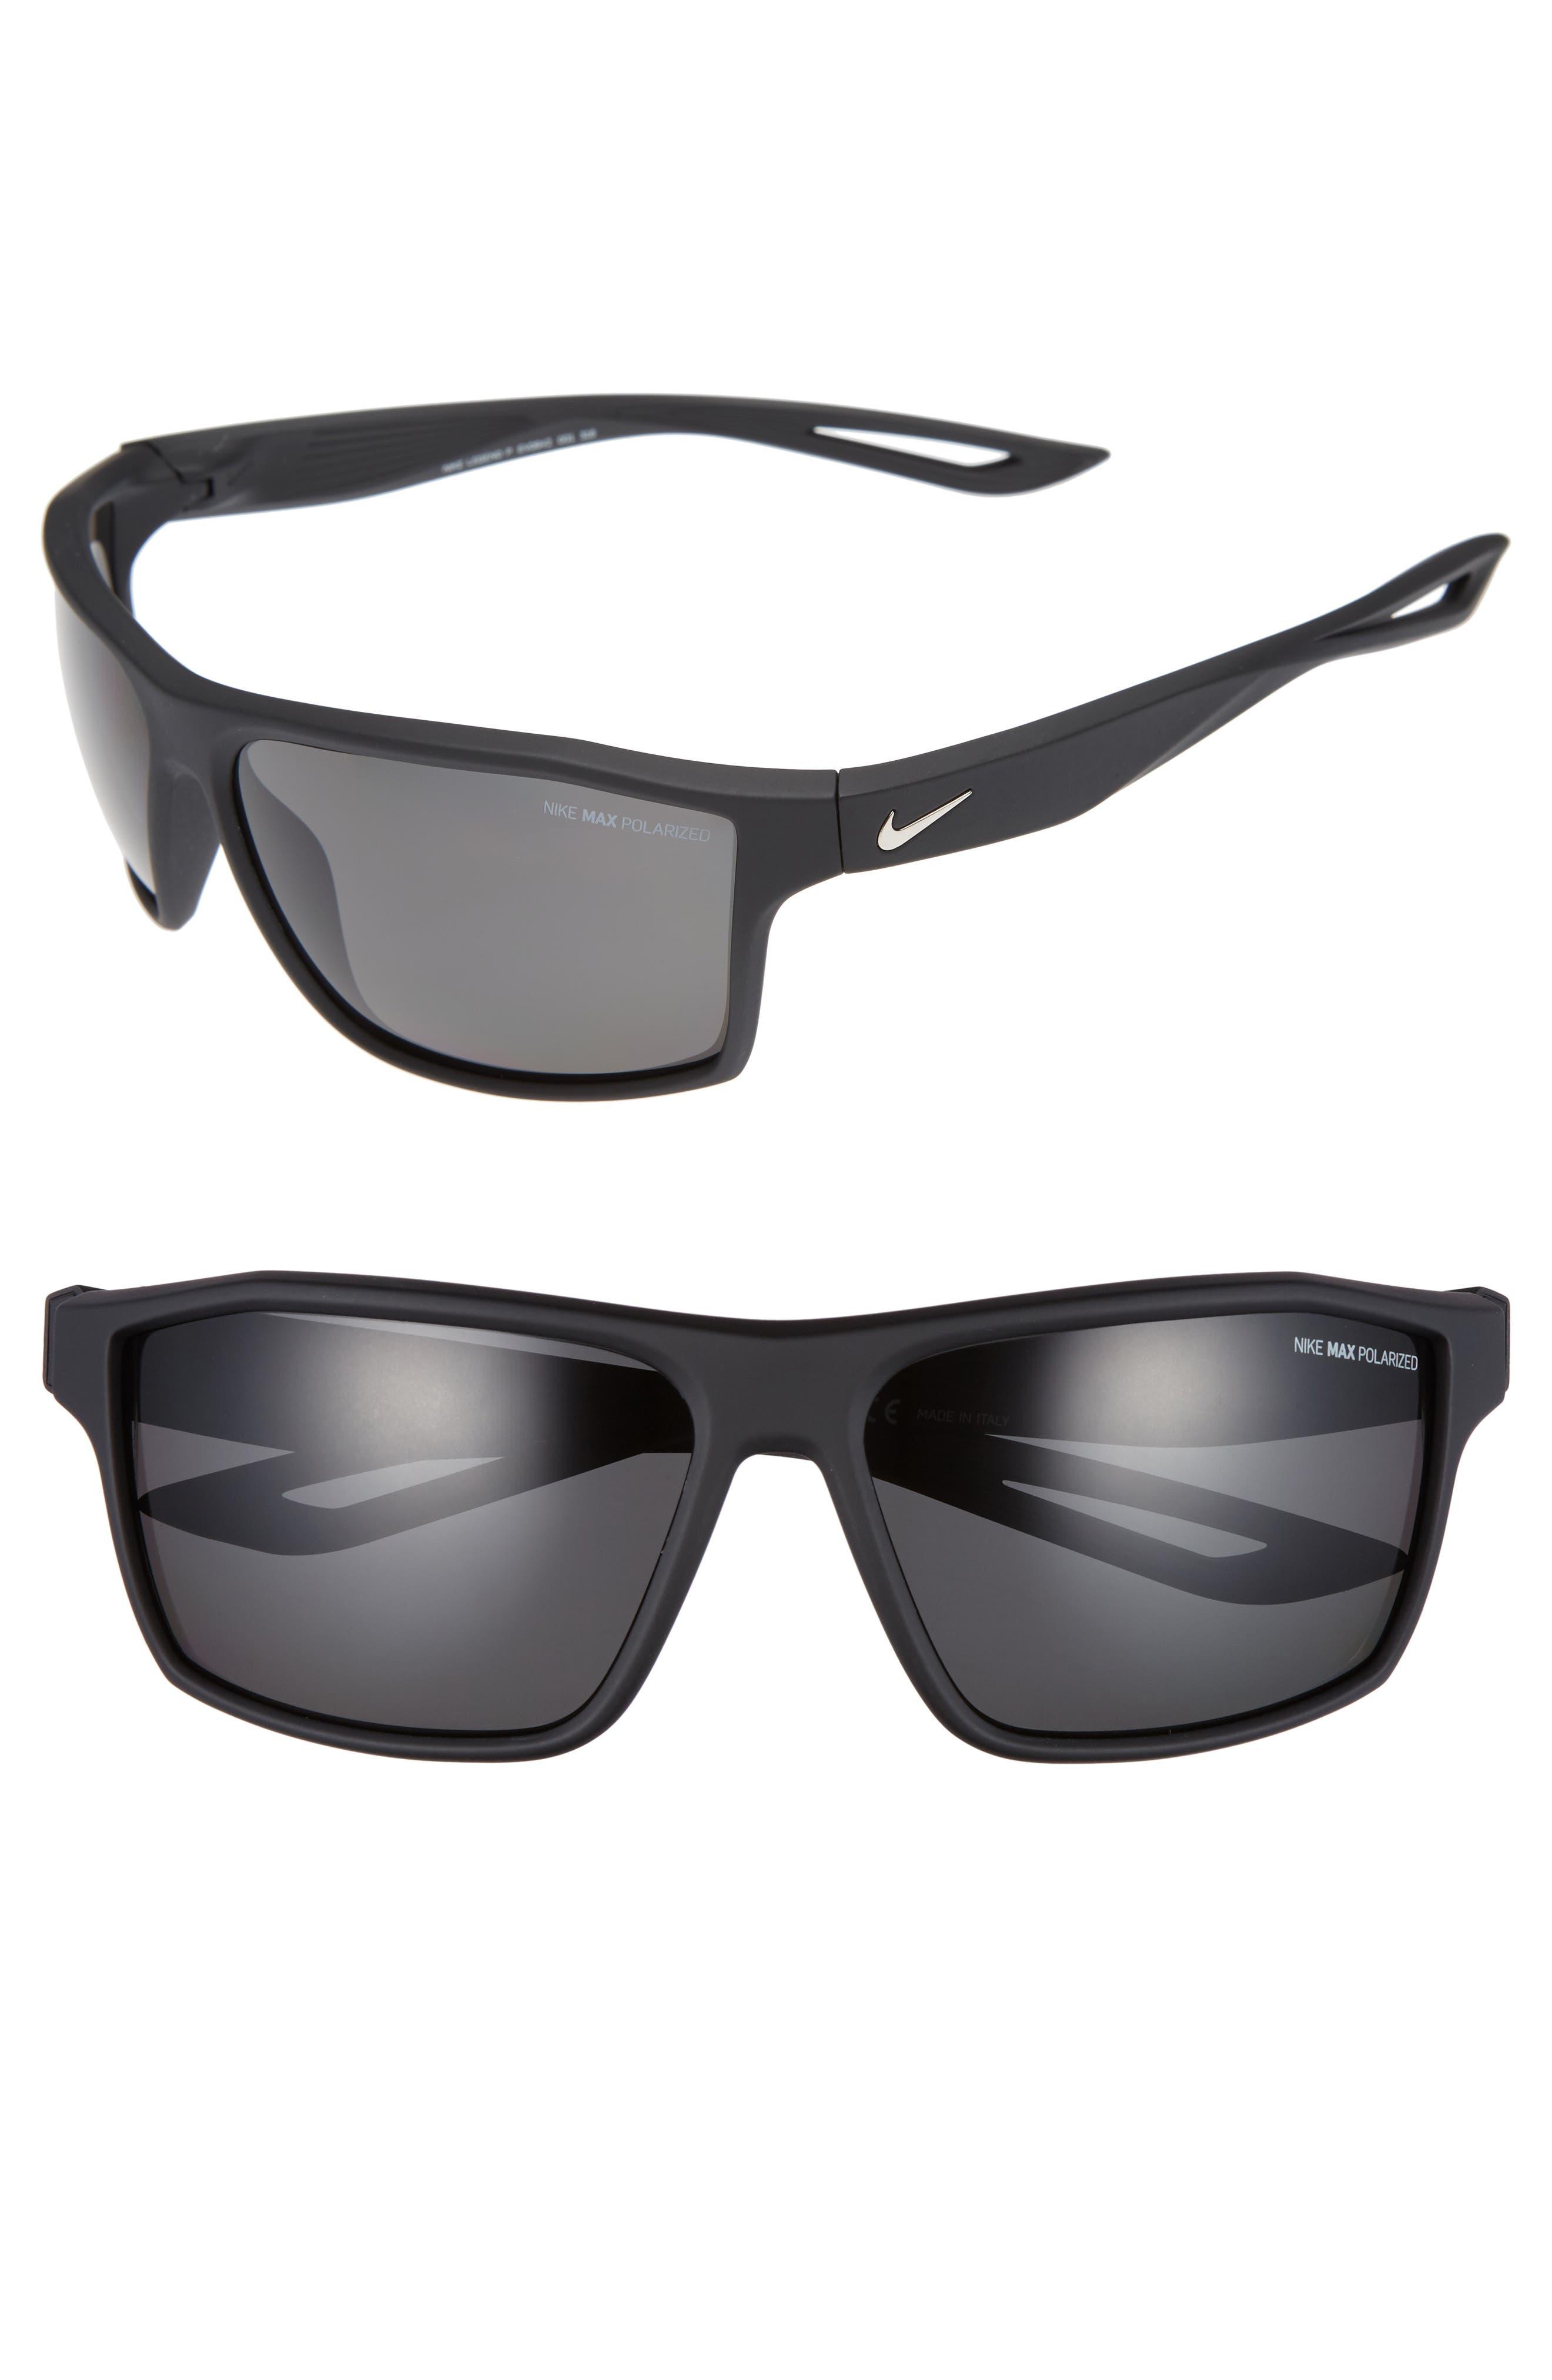 Nike Legend 65Mm Polarized Multi-Sport Sunglasses - Matte Black/ Silver